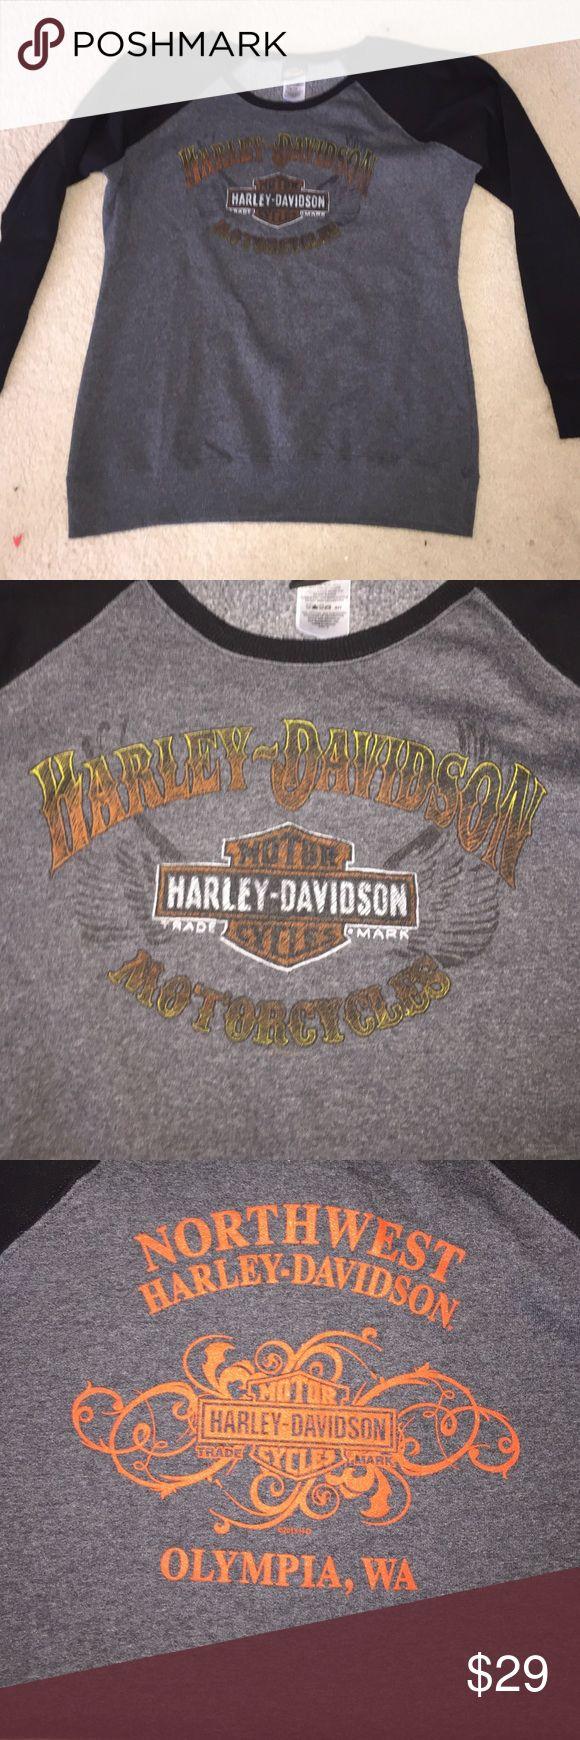 Harley Davidson sweatshirt Harley Davidson sweatshirt- front says Harley Davidson motor cycles and the back reads Northwest Harley Davidson Olympia Wa- is XL but may fit like large Harley-Davidson Tops Sweatshirts & Hoodies